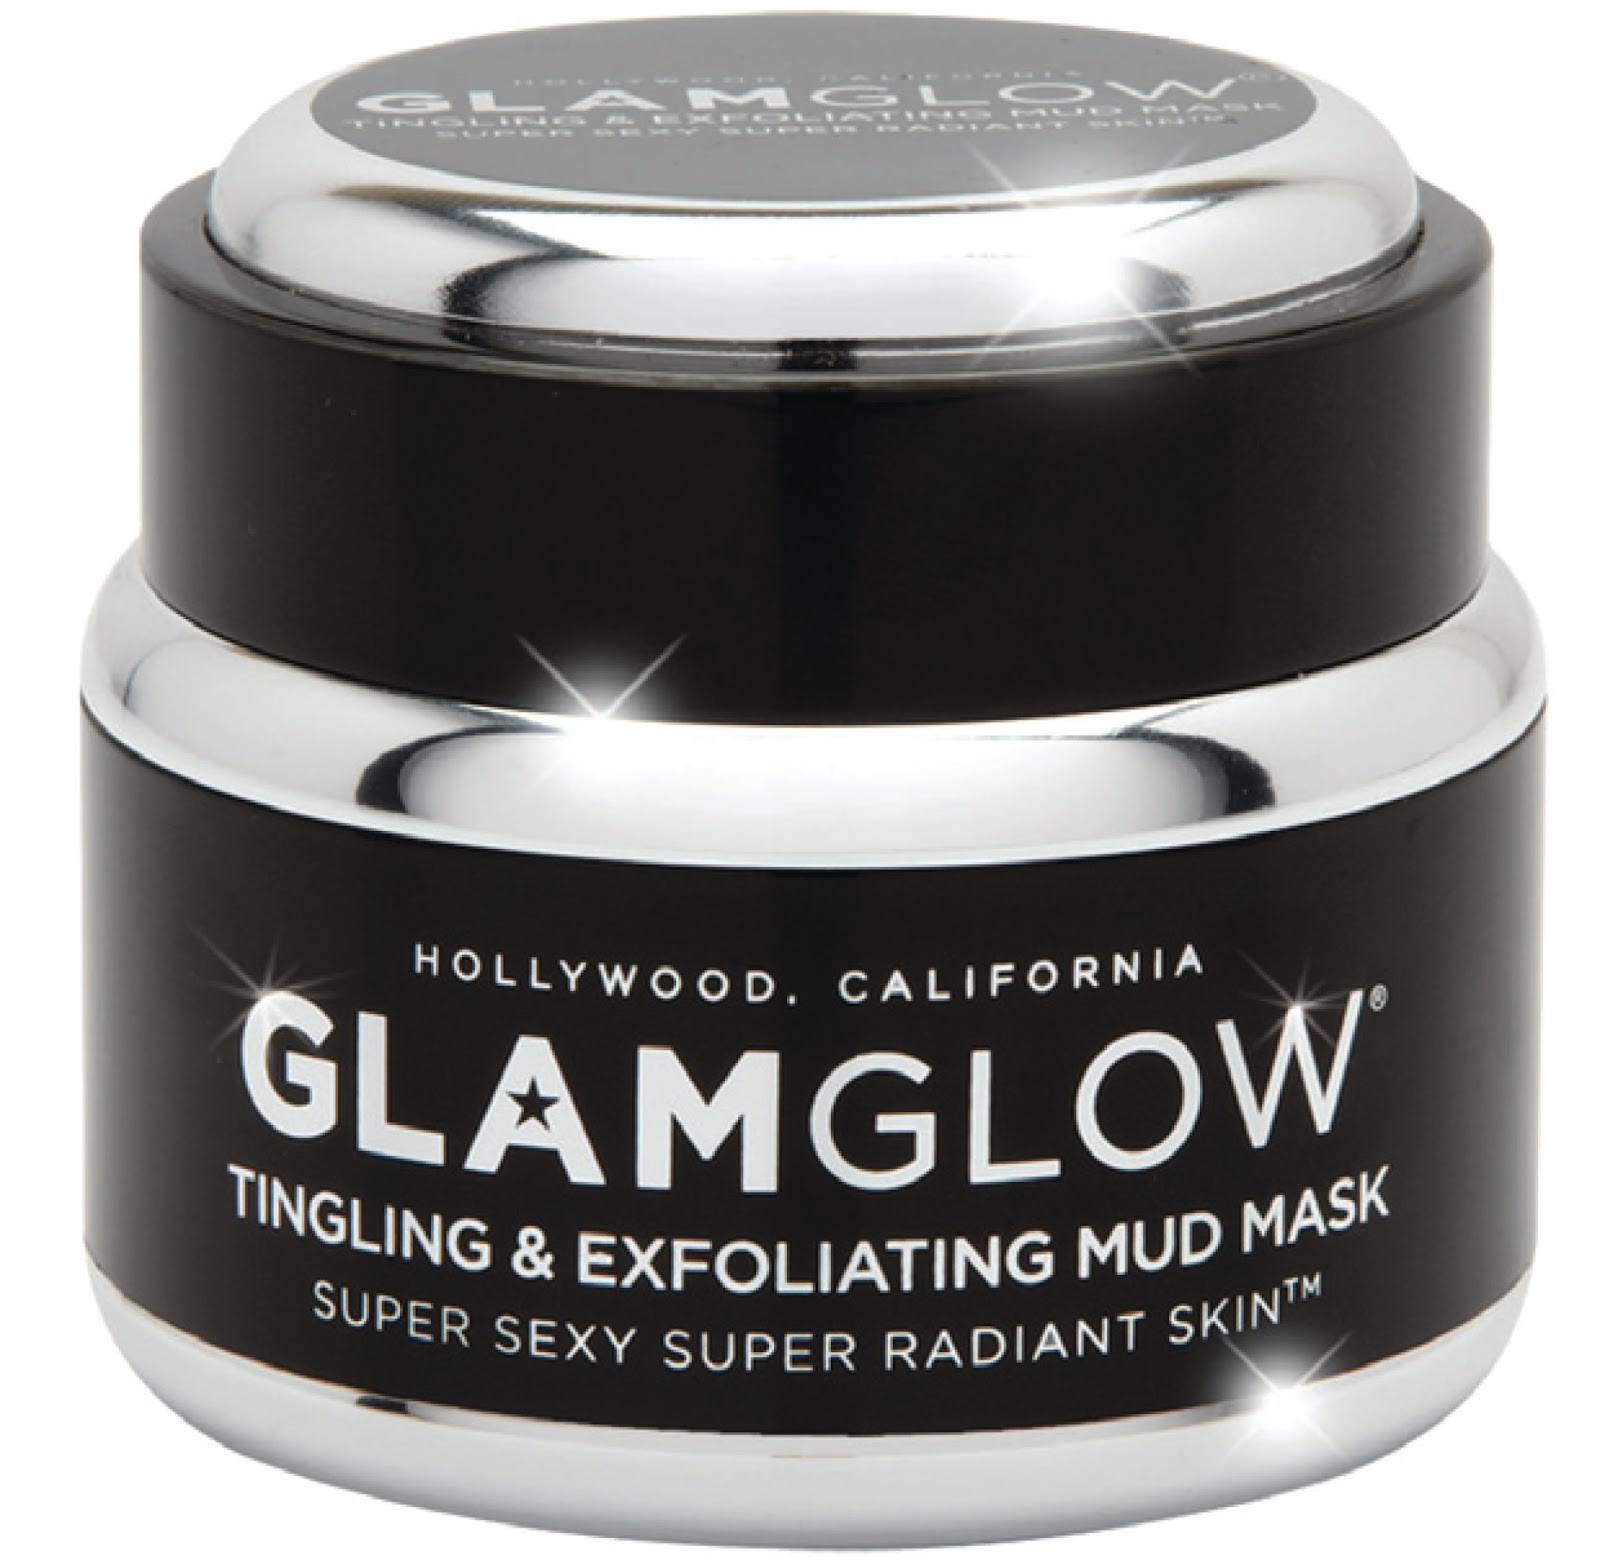 glamglow - DriverLayer Search Engine